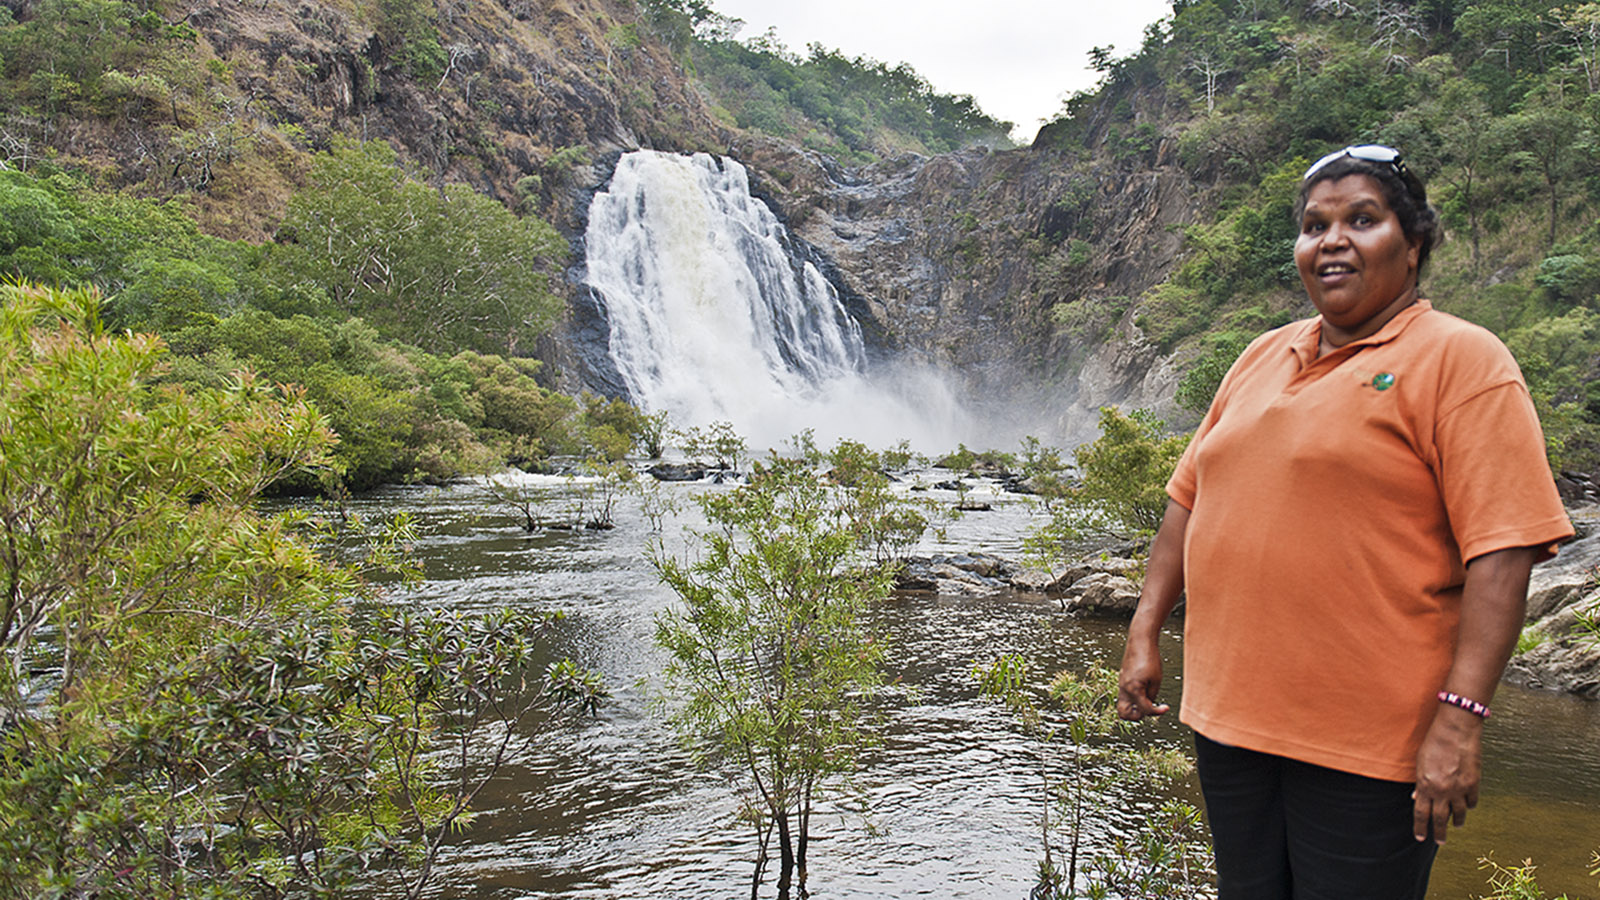 Mudcrabbing & mehr: Frances Walker erzählt an den Bloomfield Falls vom Leben ihres Stammes. Foto: Hilke Maunder